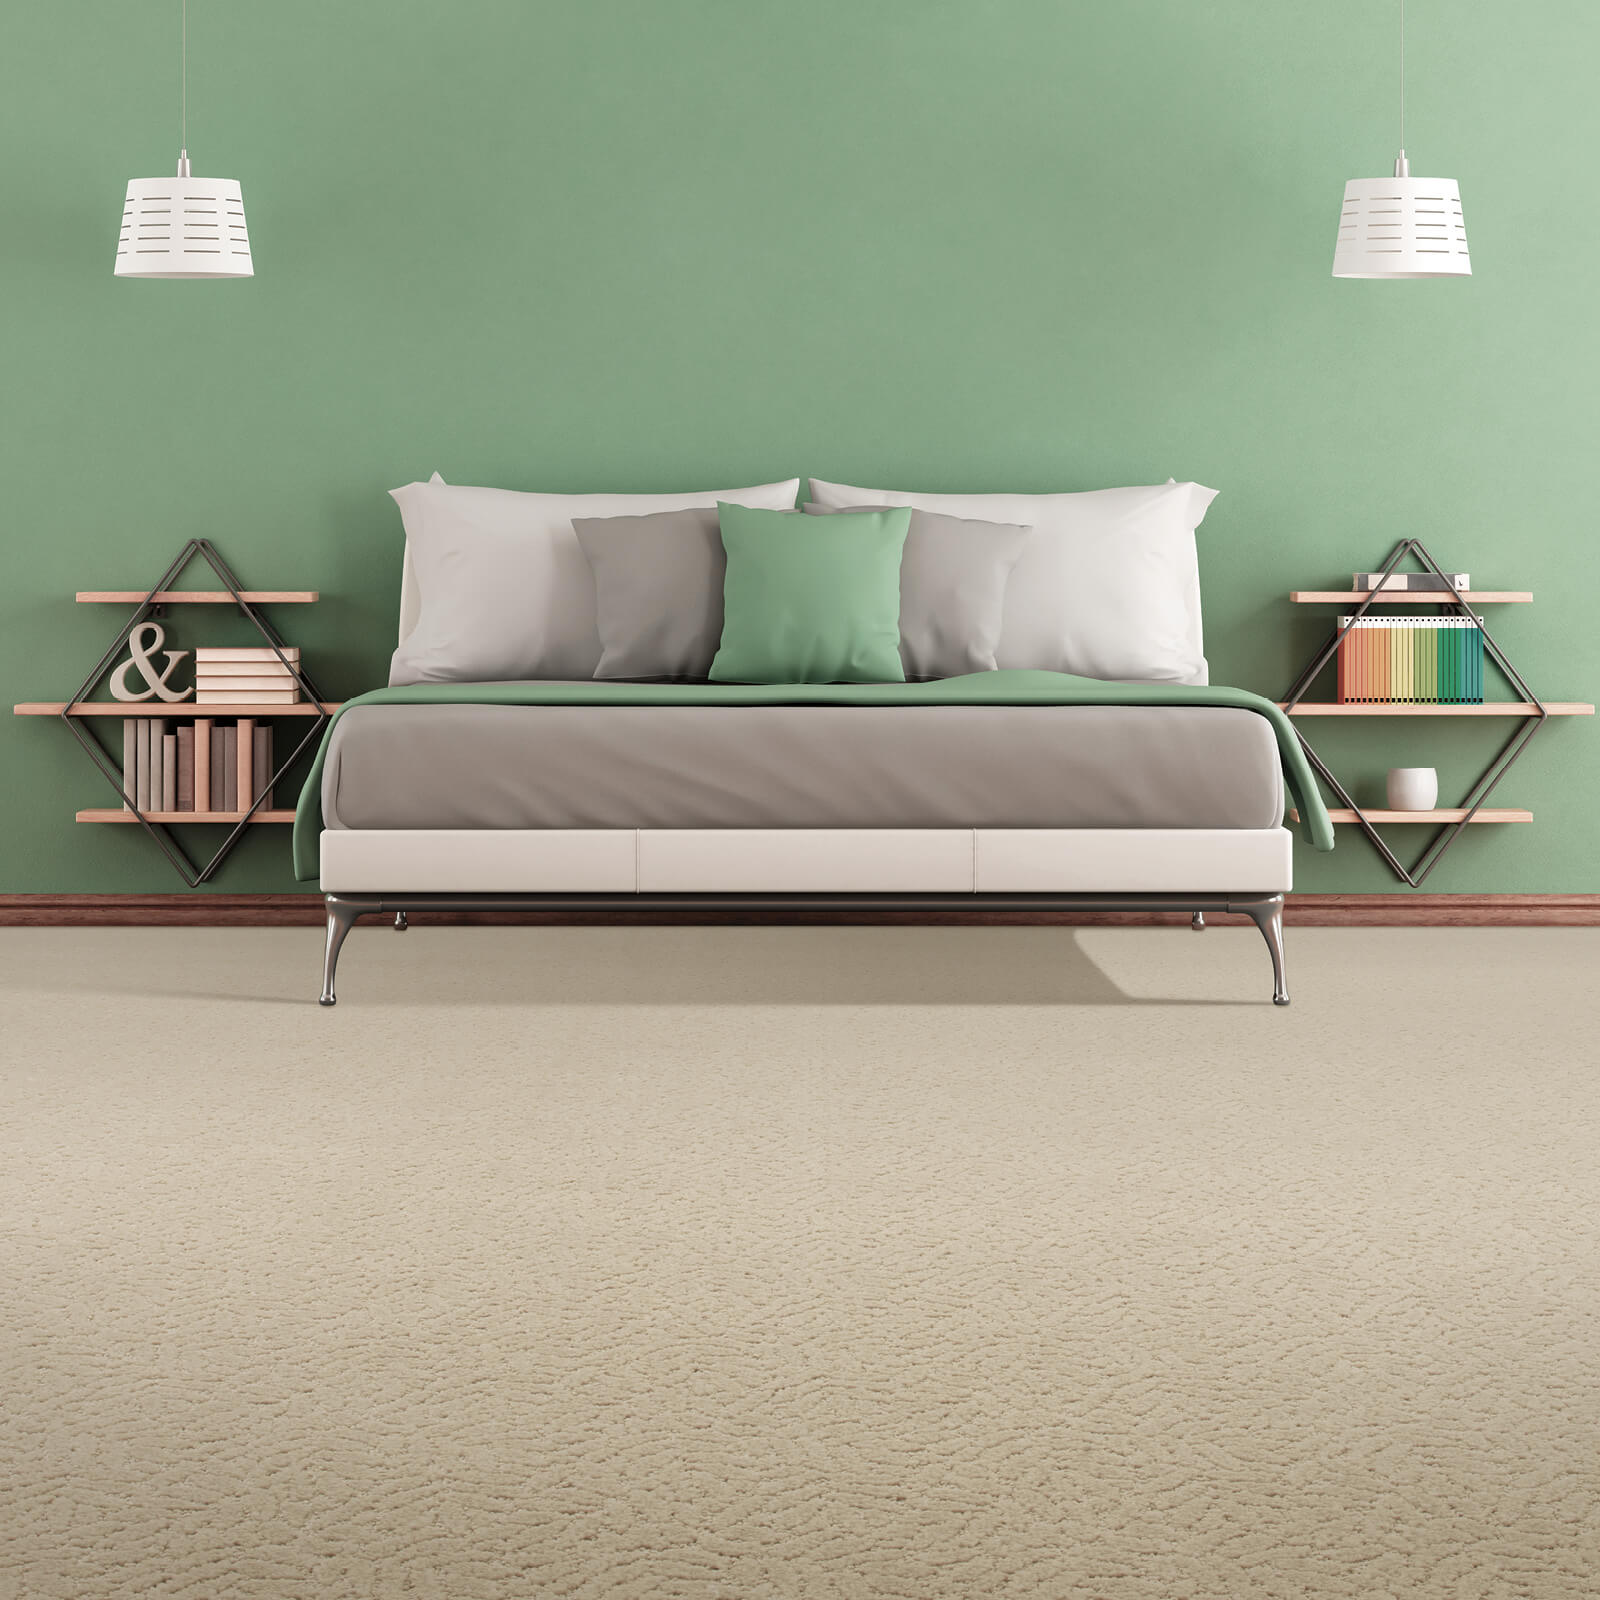 Green colorwall | Great Floors